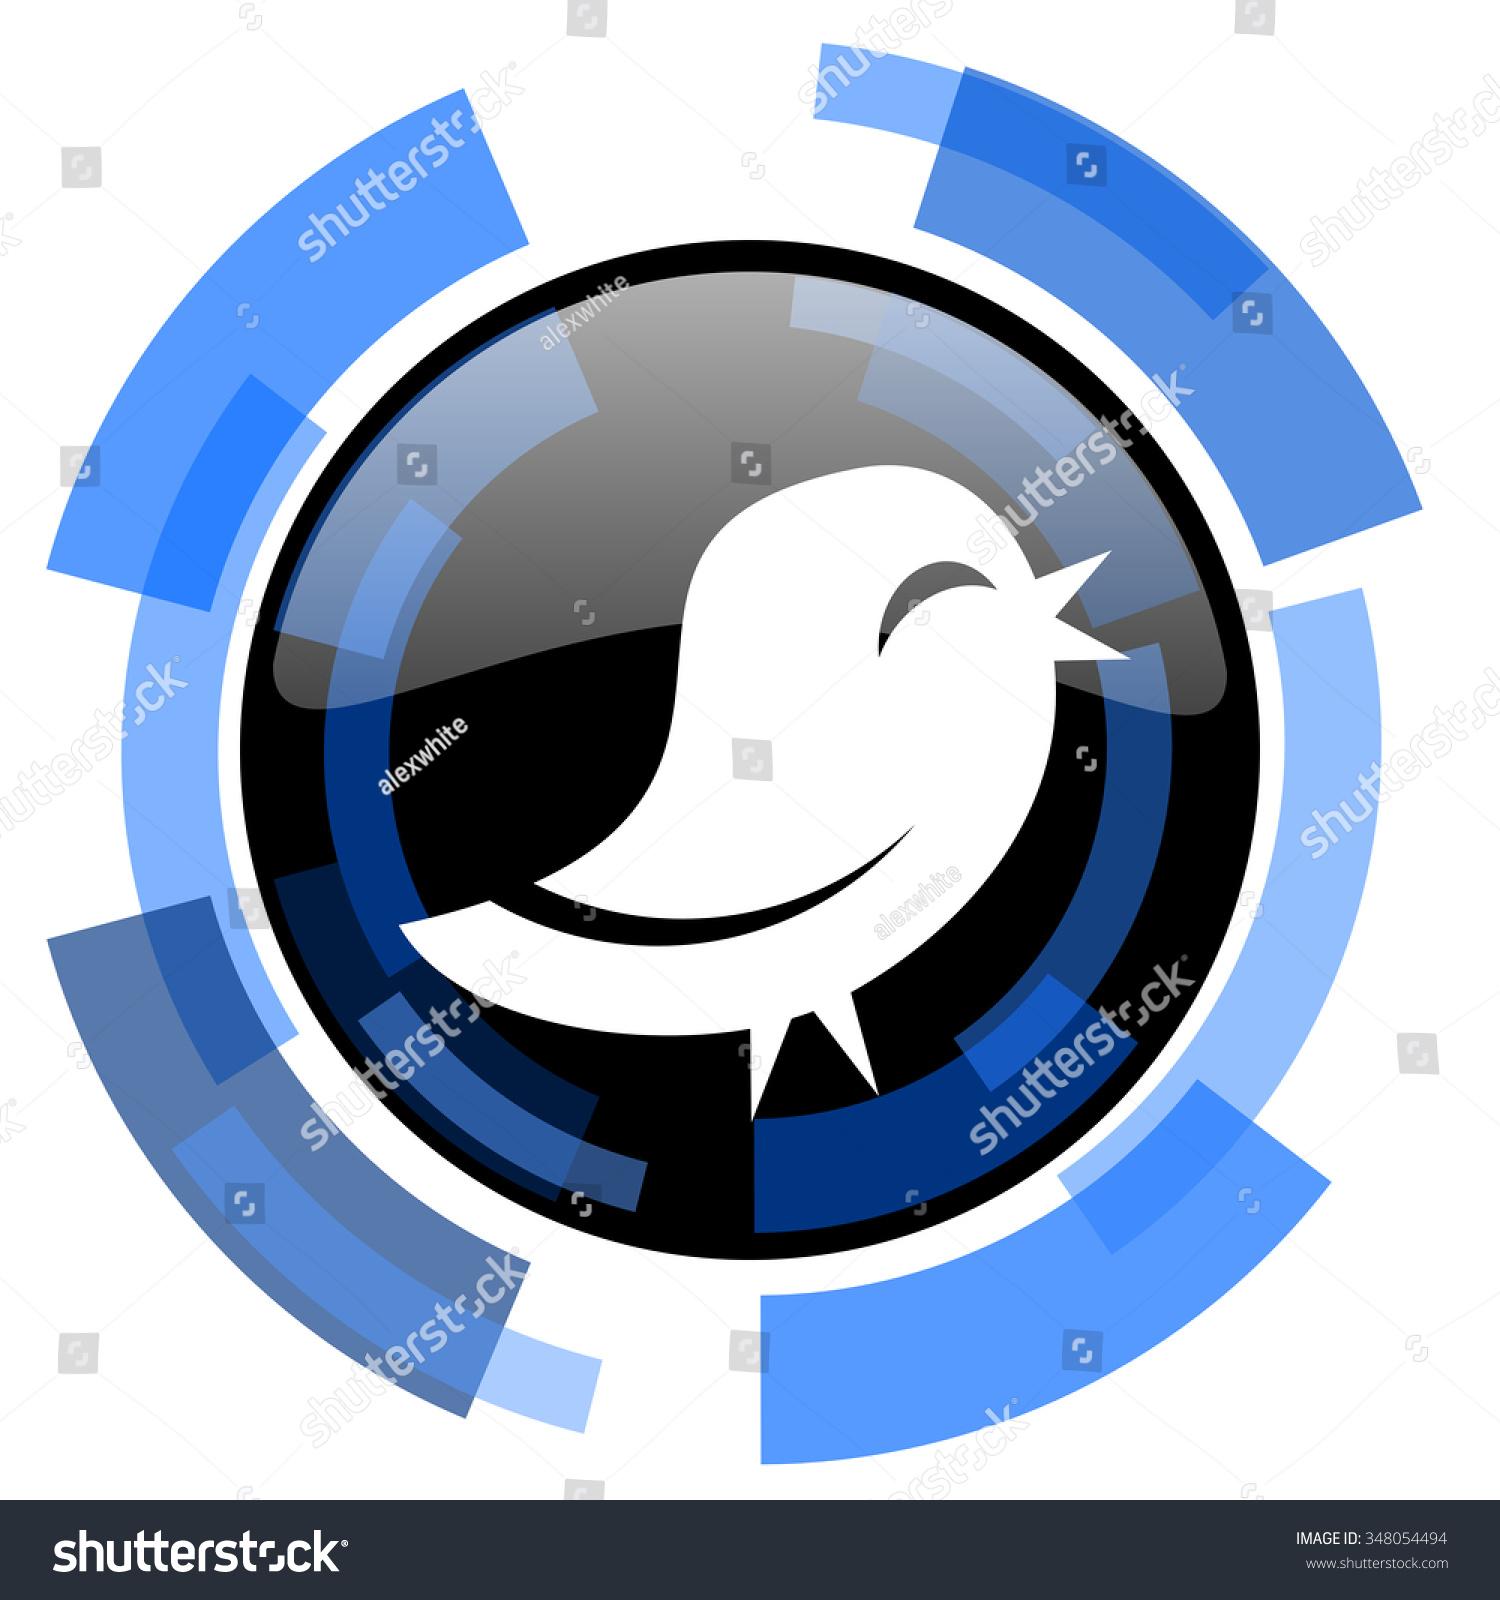 Twitter Black Blue Glossy Web Icon Stock Illustration